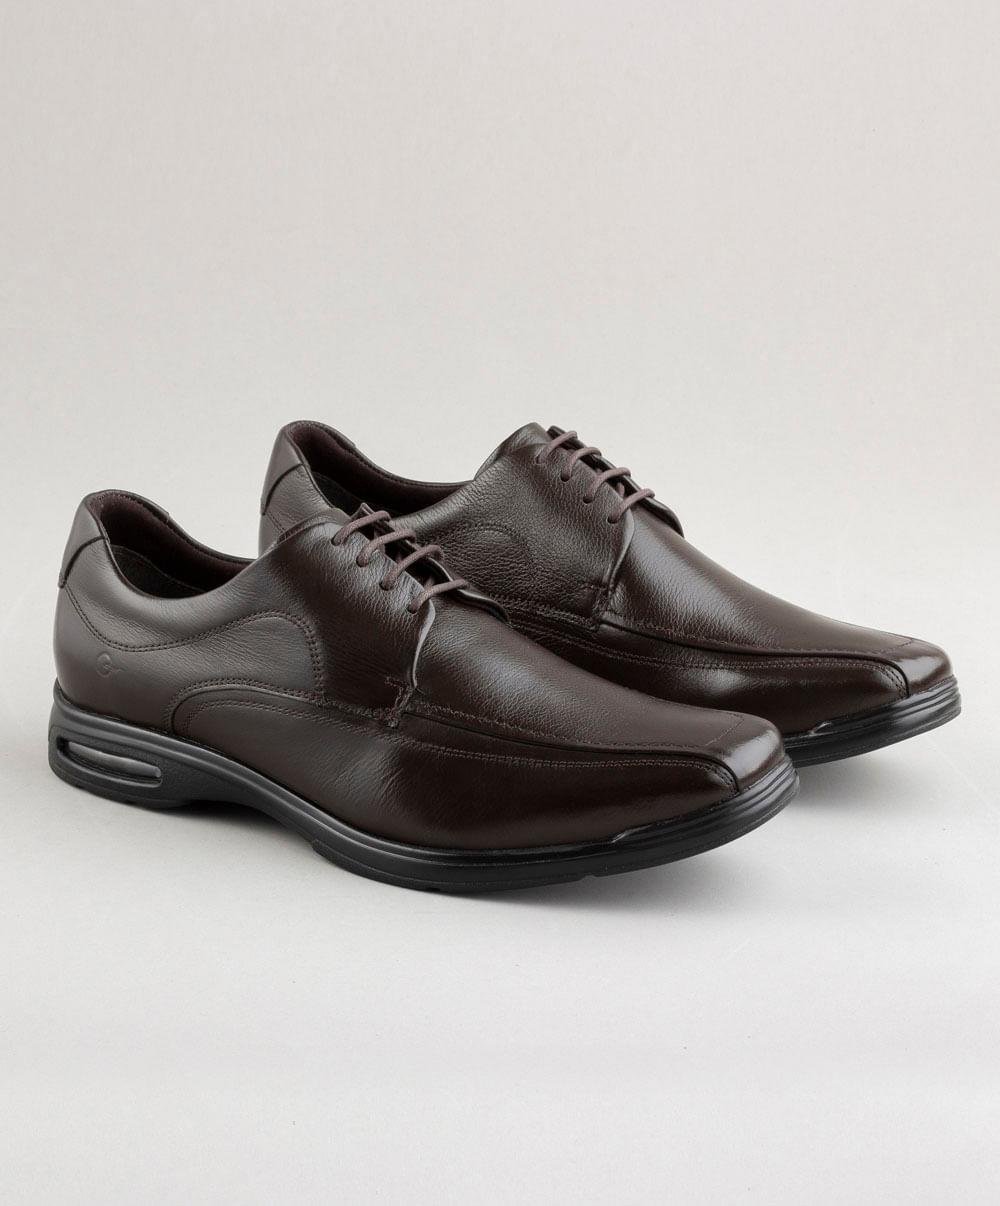 Sapato Smart Comfort Air Spot Brown Cadarço